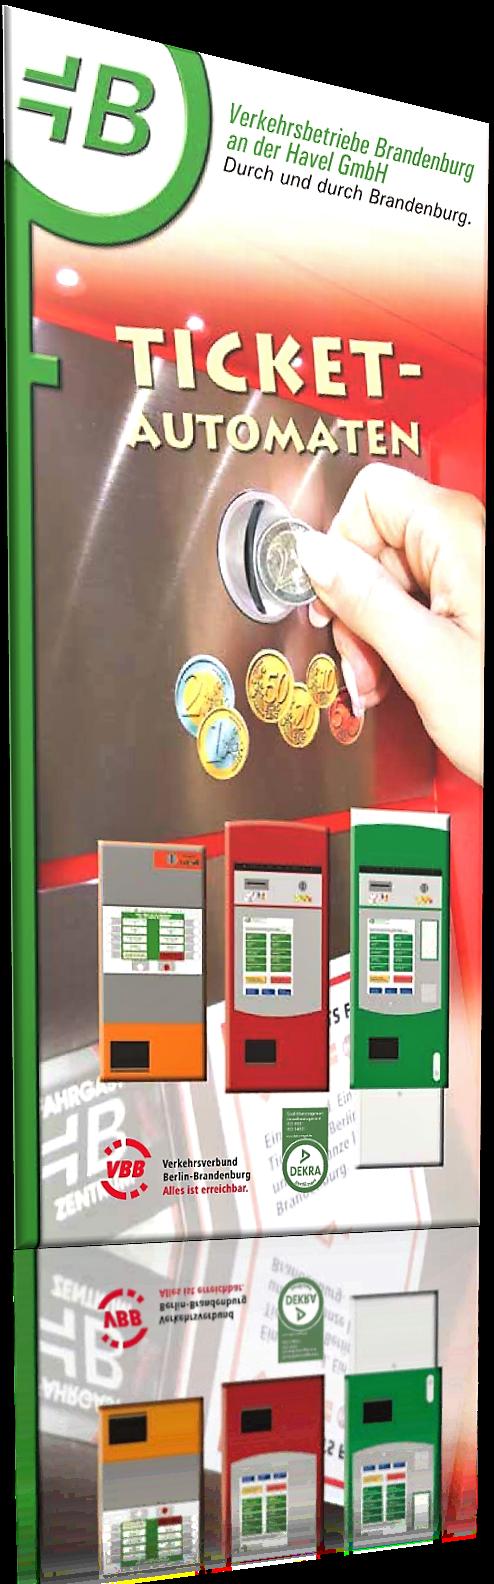 Ticketautomat2015